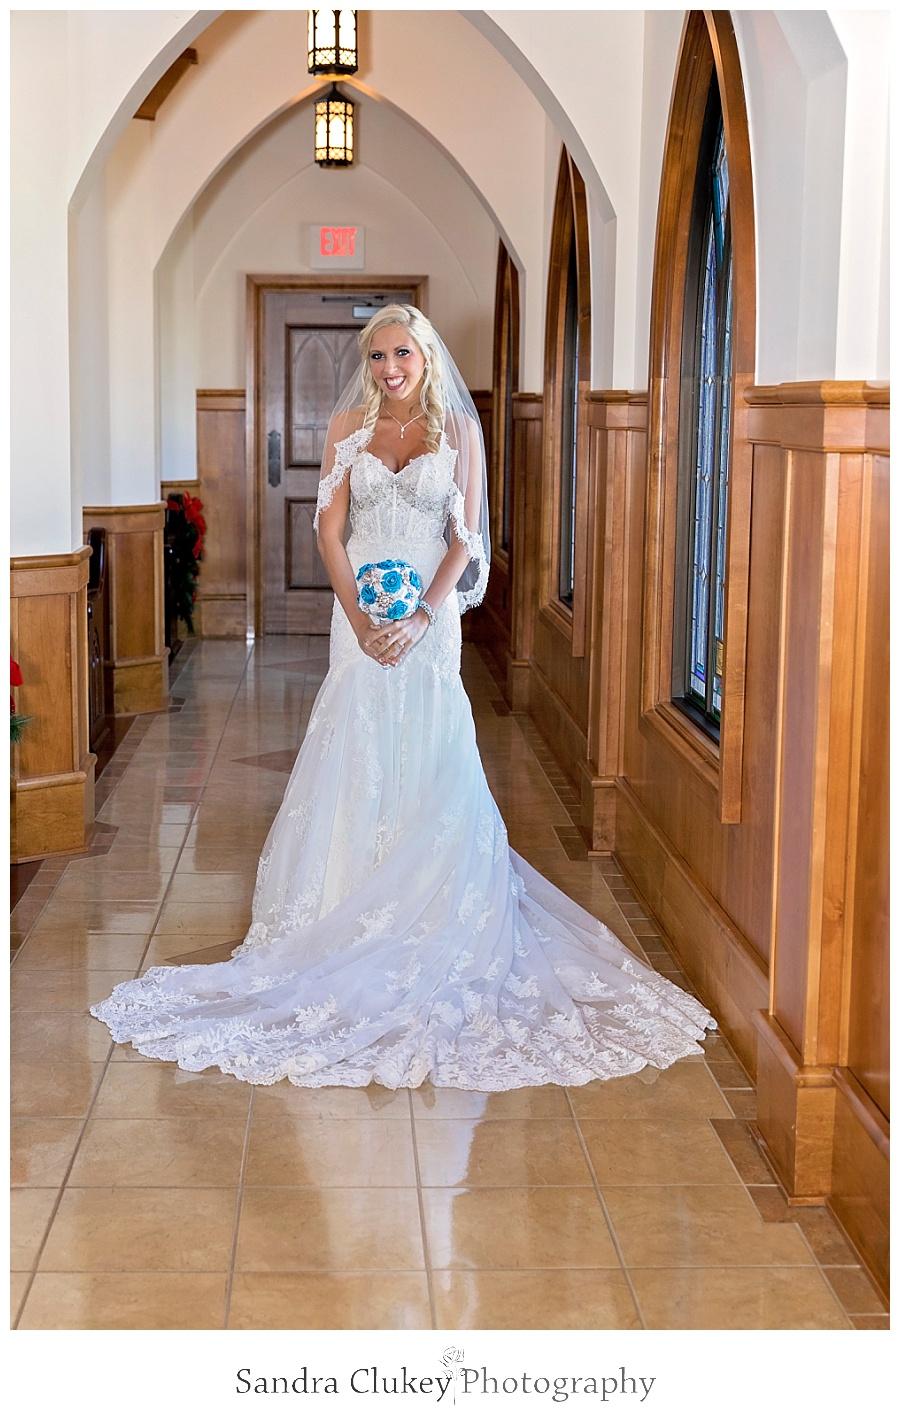 Dazzling bride in church aisle